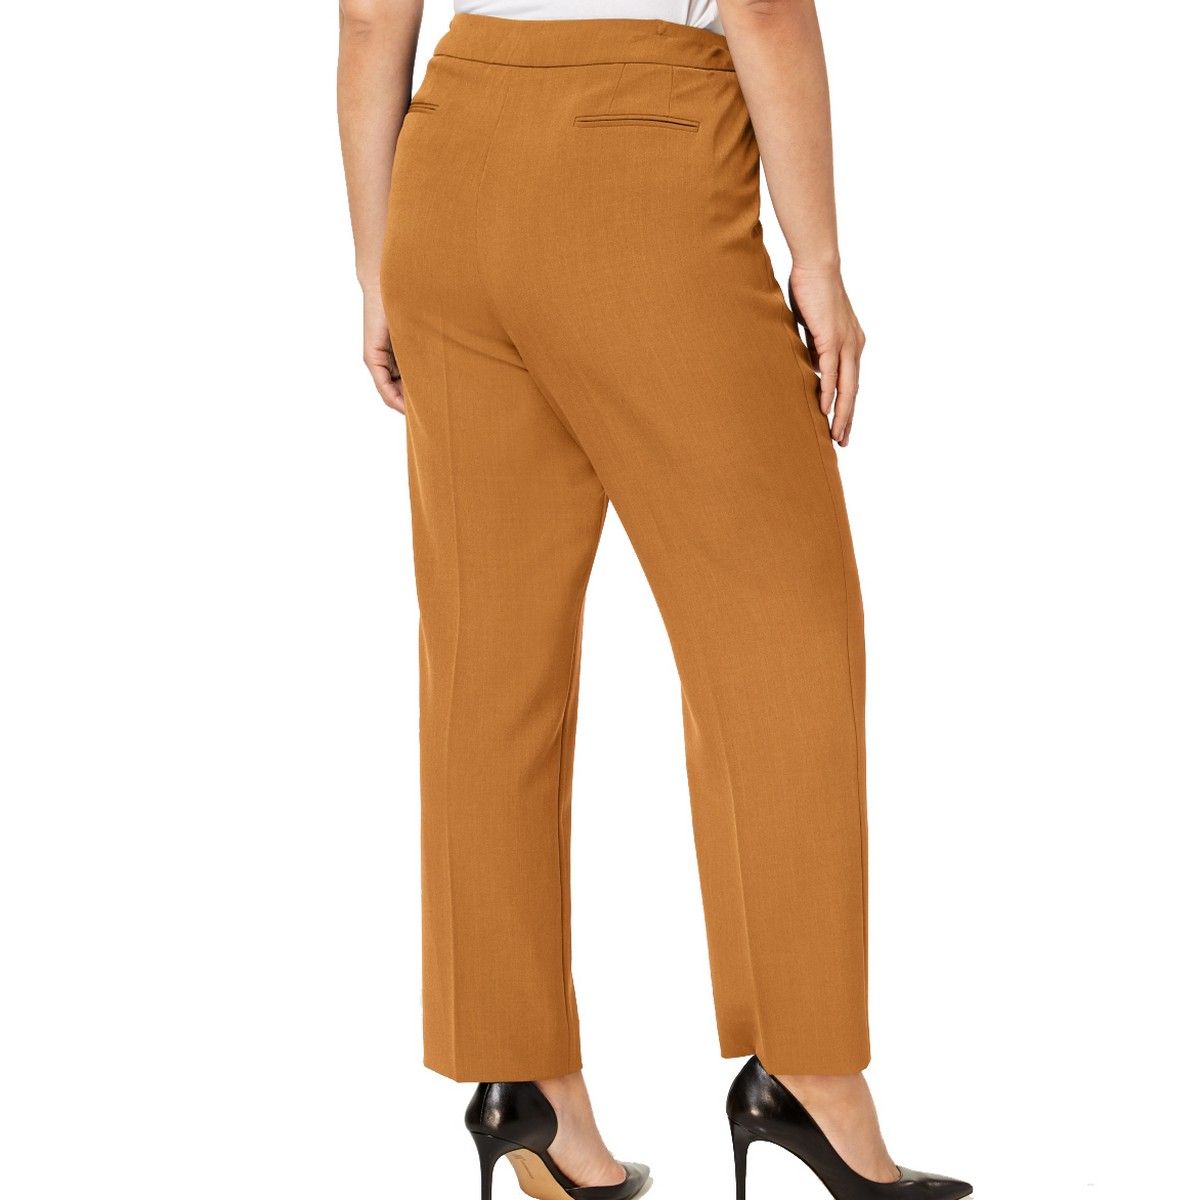 ANNE-KLEIN-NEW-Women-039-s-Plus-Size-Extended-tab-Dress-Pants-TEDO thumbnail 8